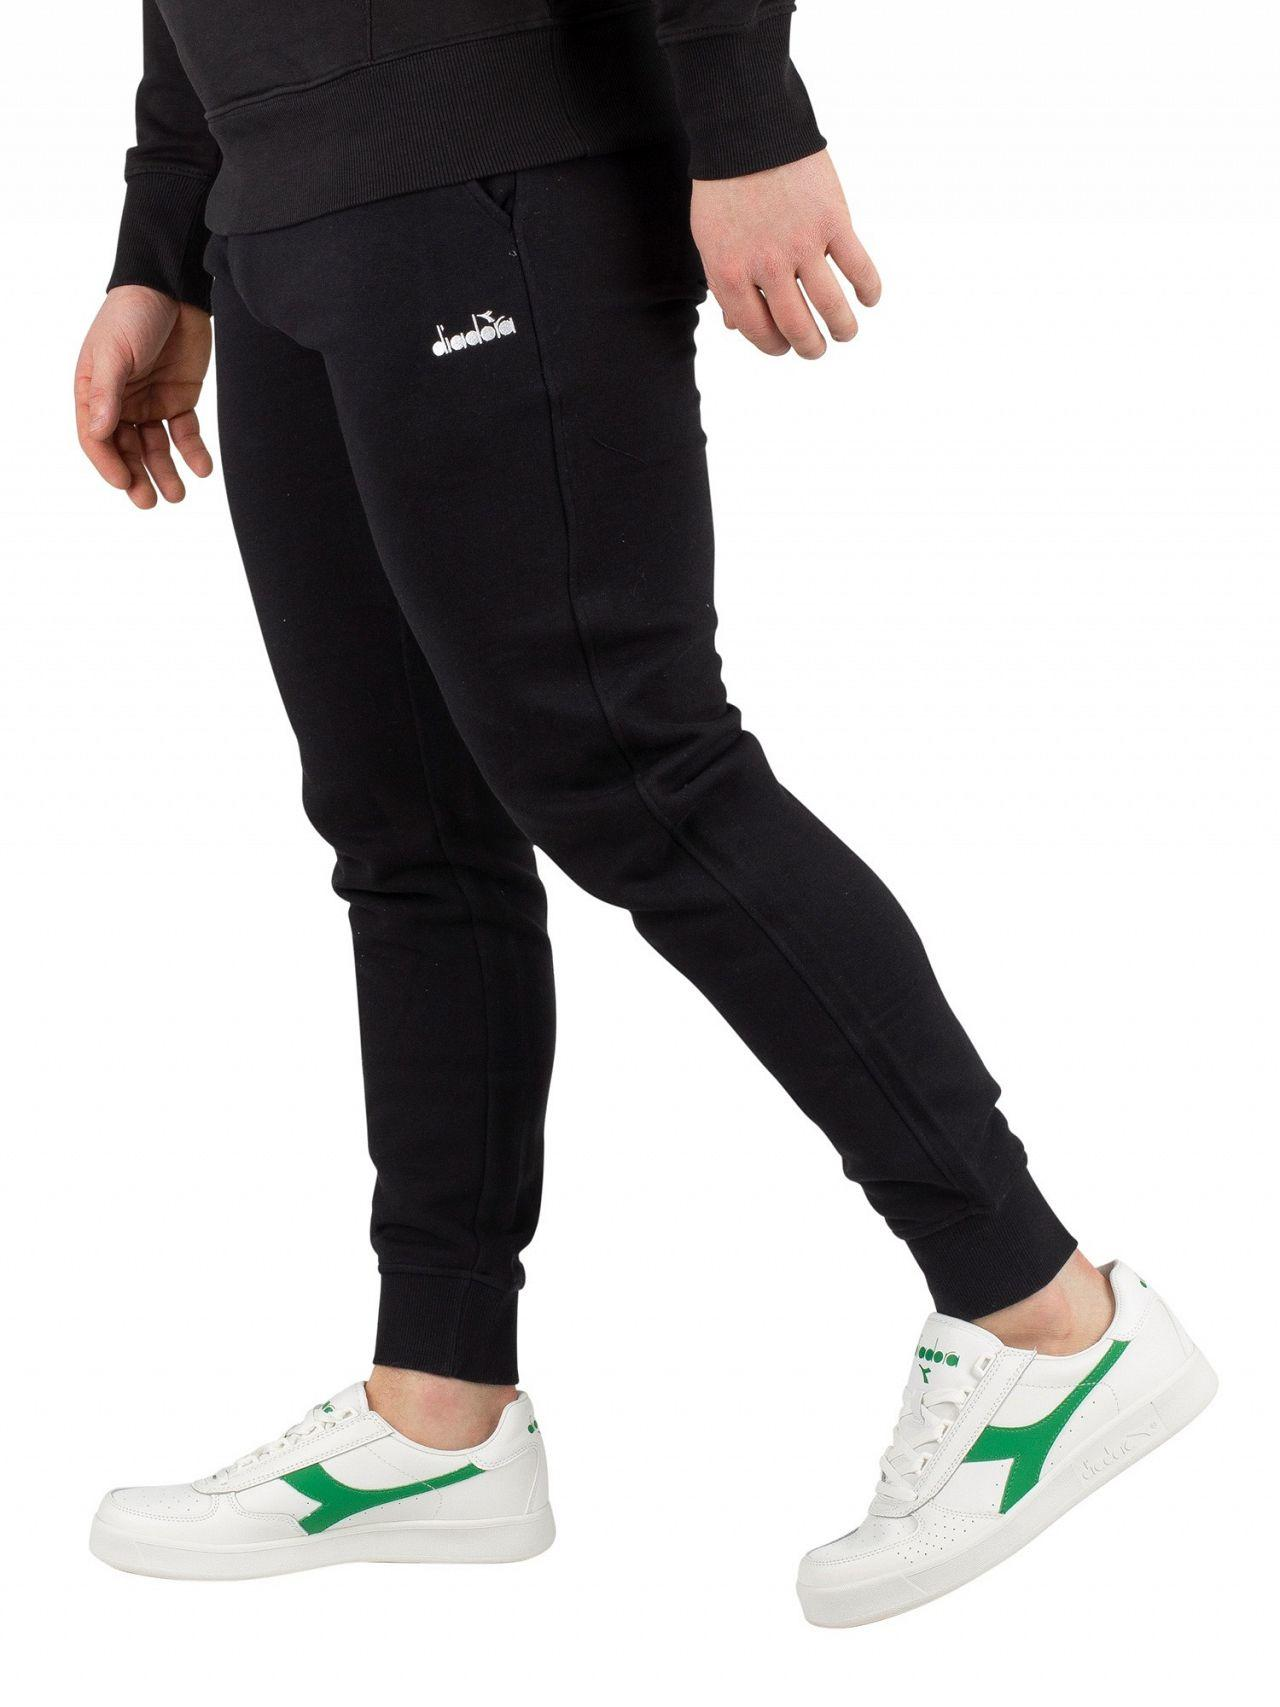 Diadora Black Logo Joggers in Black for Men - Lyst 239ce3b63